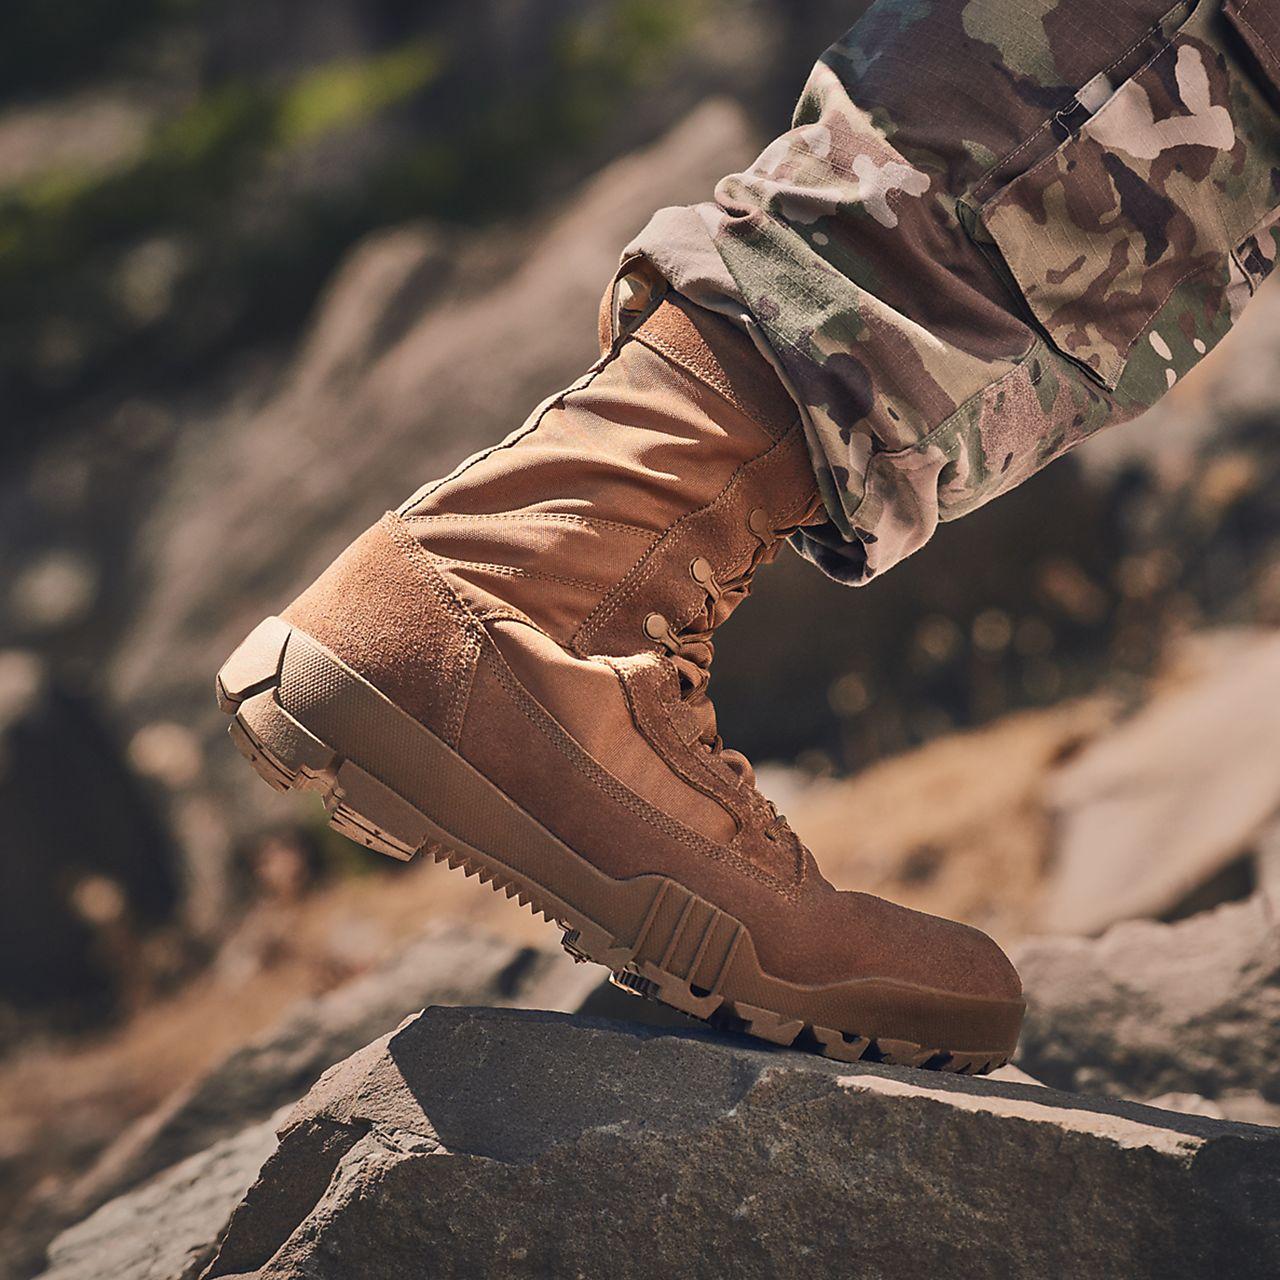 buy online d0f0c b7cd5 ... Nike SFB Jungle 8